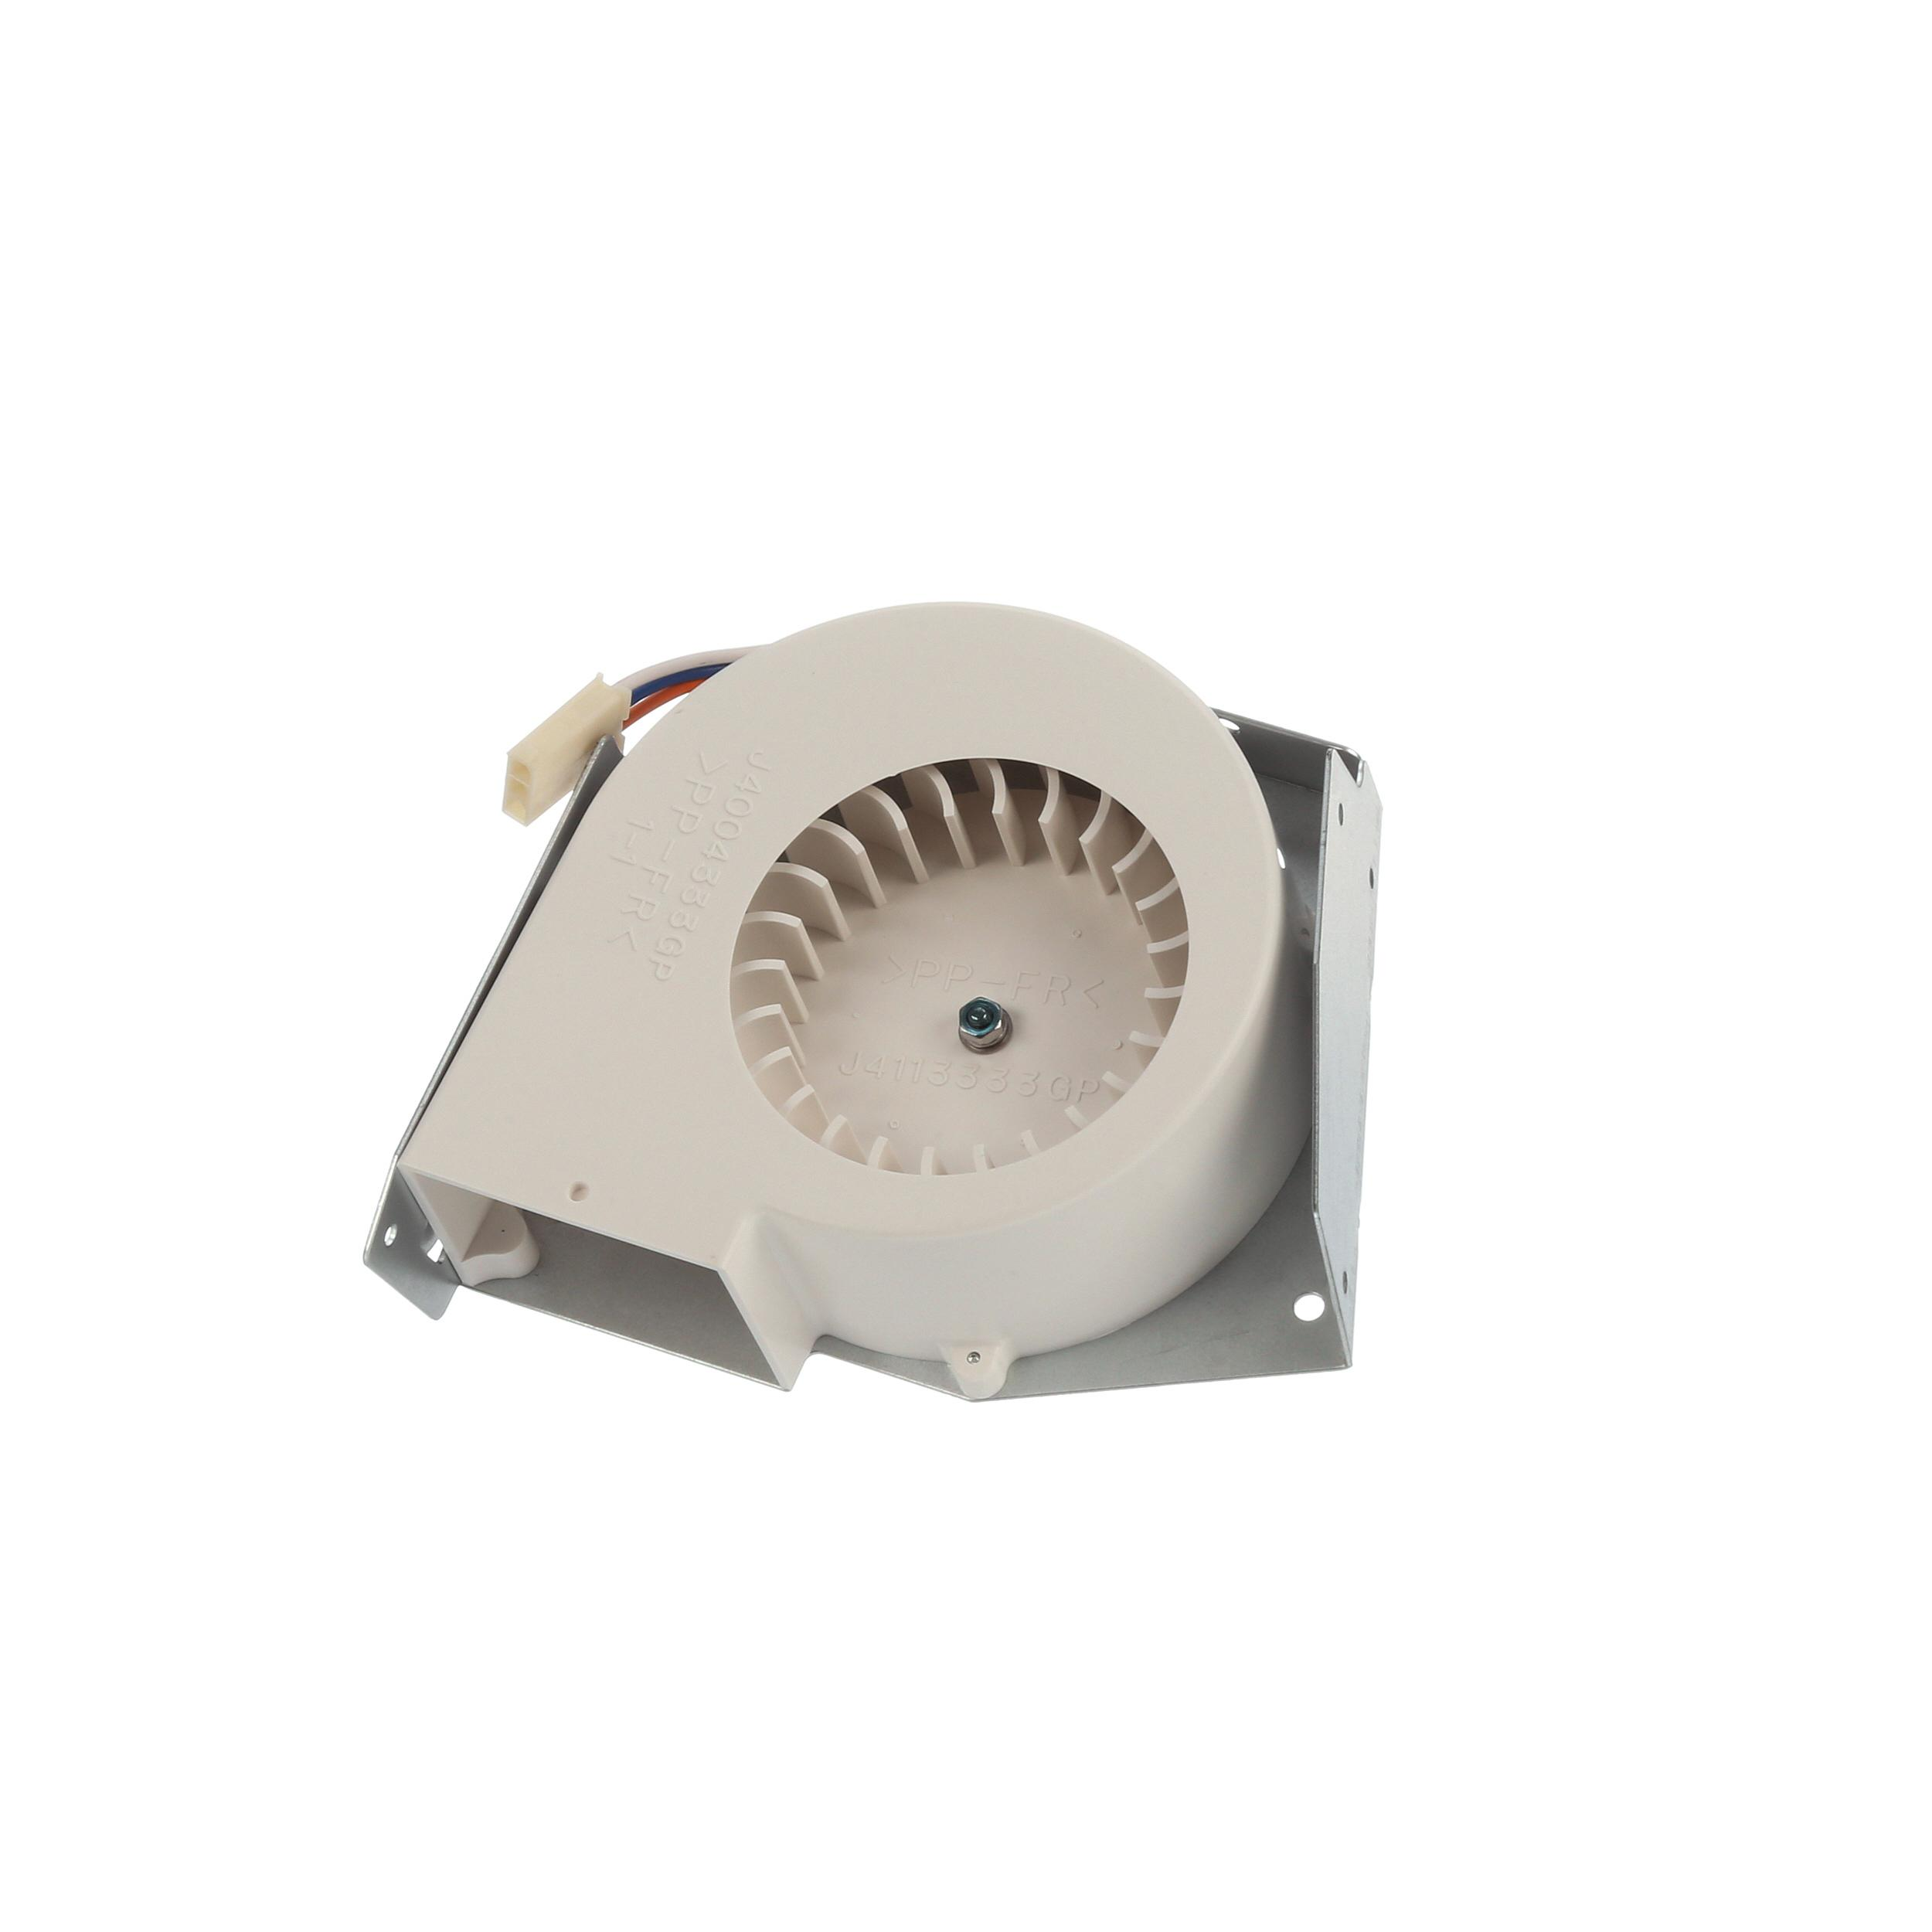 PANASONIC FAN MOTOR, 208/230V, 60hz, 54W